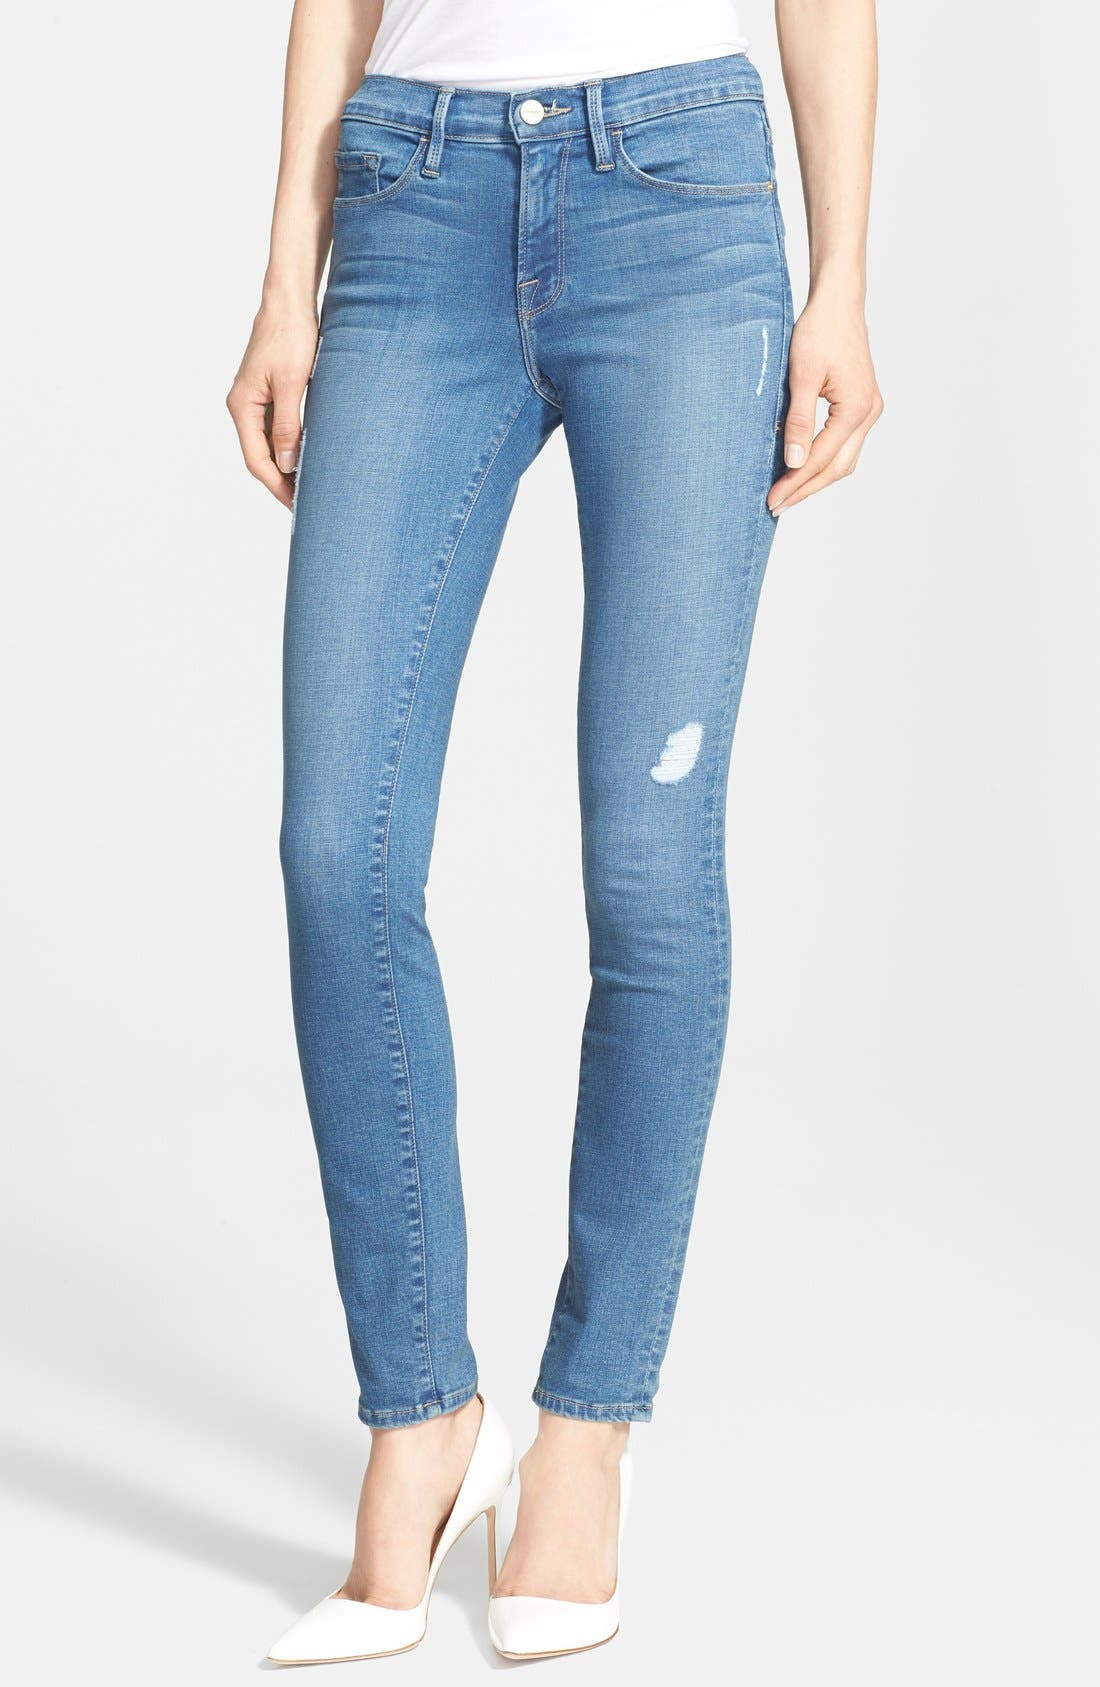 Alternate Image 1 Selected - Frame Denim 'Le Skinny de Jeanne' Jeans (Alverstone) (Nordstrom Exclusive)